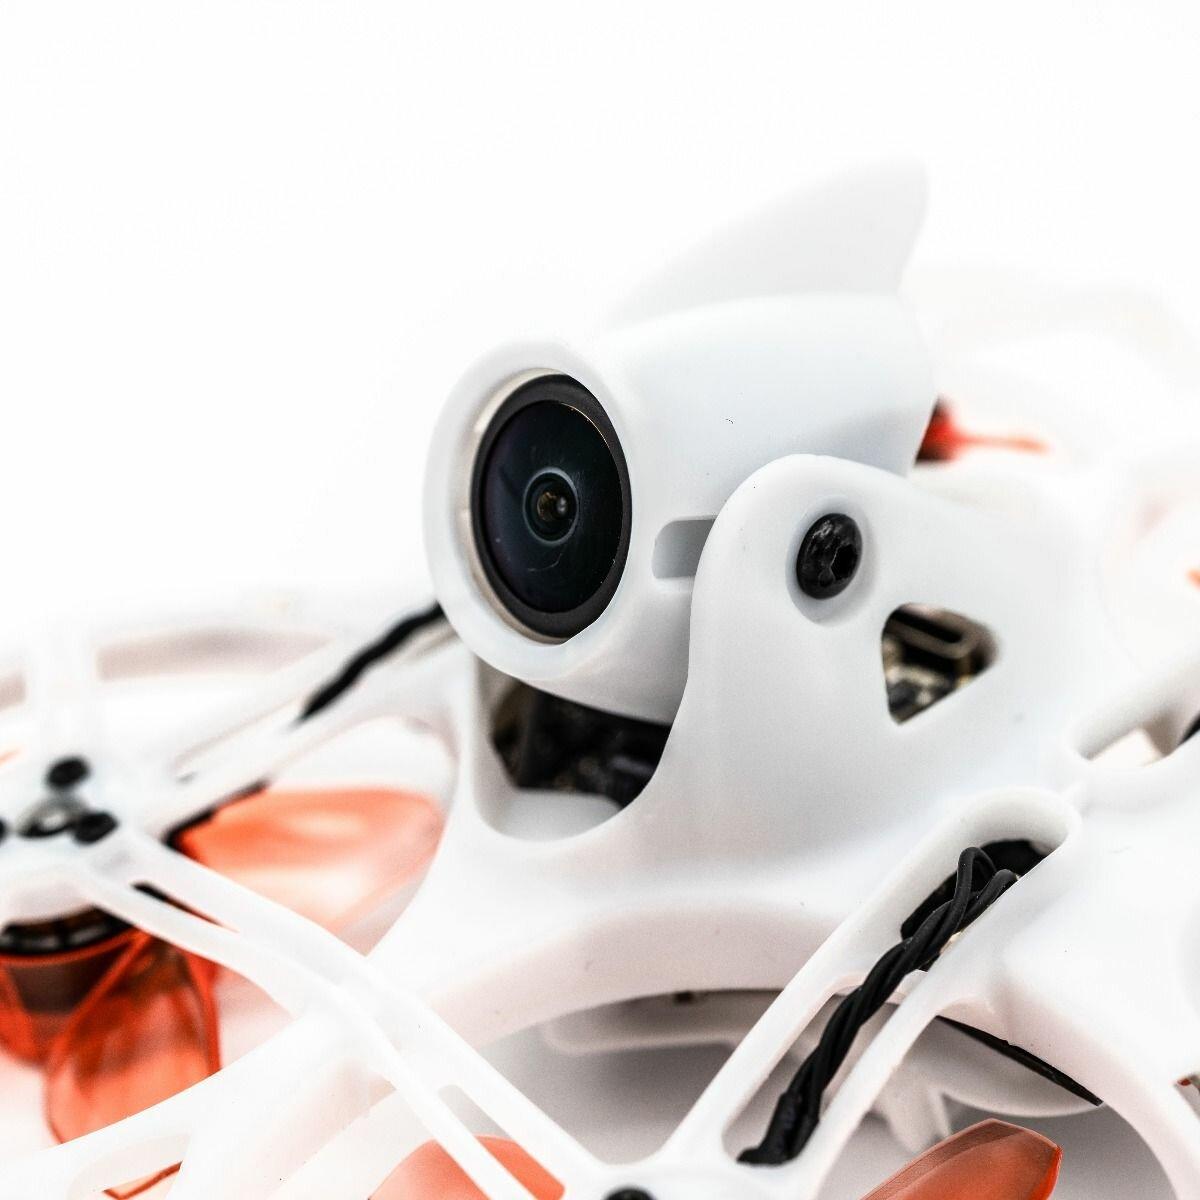 EMAX Tinyhawk II 75mm 1-2S Whoop FPV Racing Drone RTF FrSky D8 Runcam Nano2 Cam 25/100 / 200mw VTX 5A Blheli_S ESC